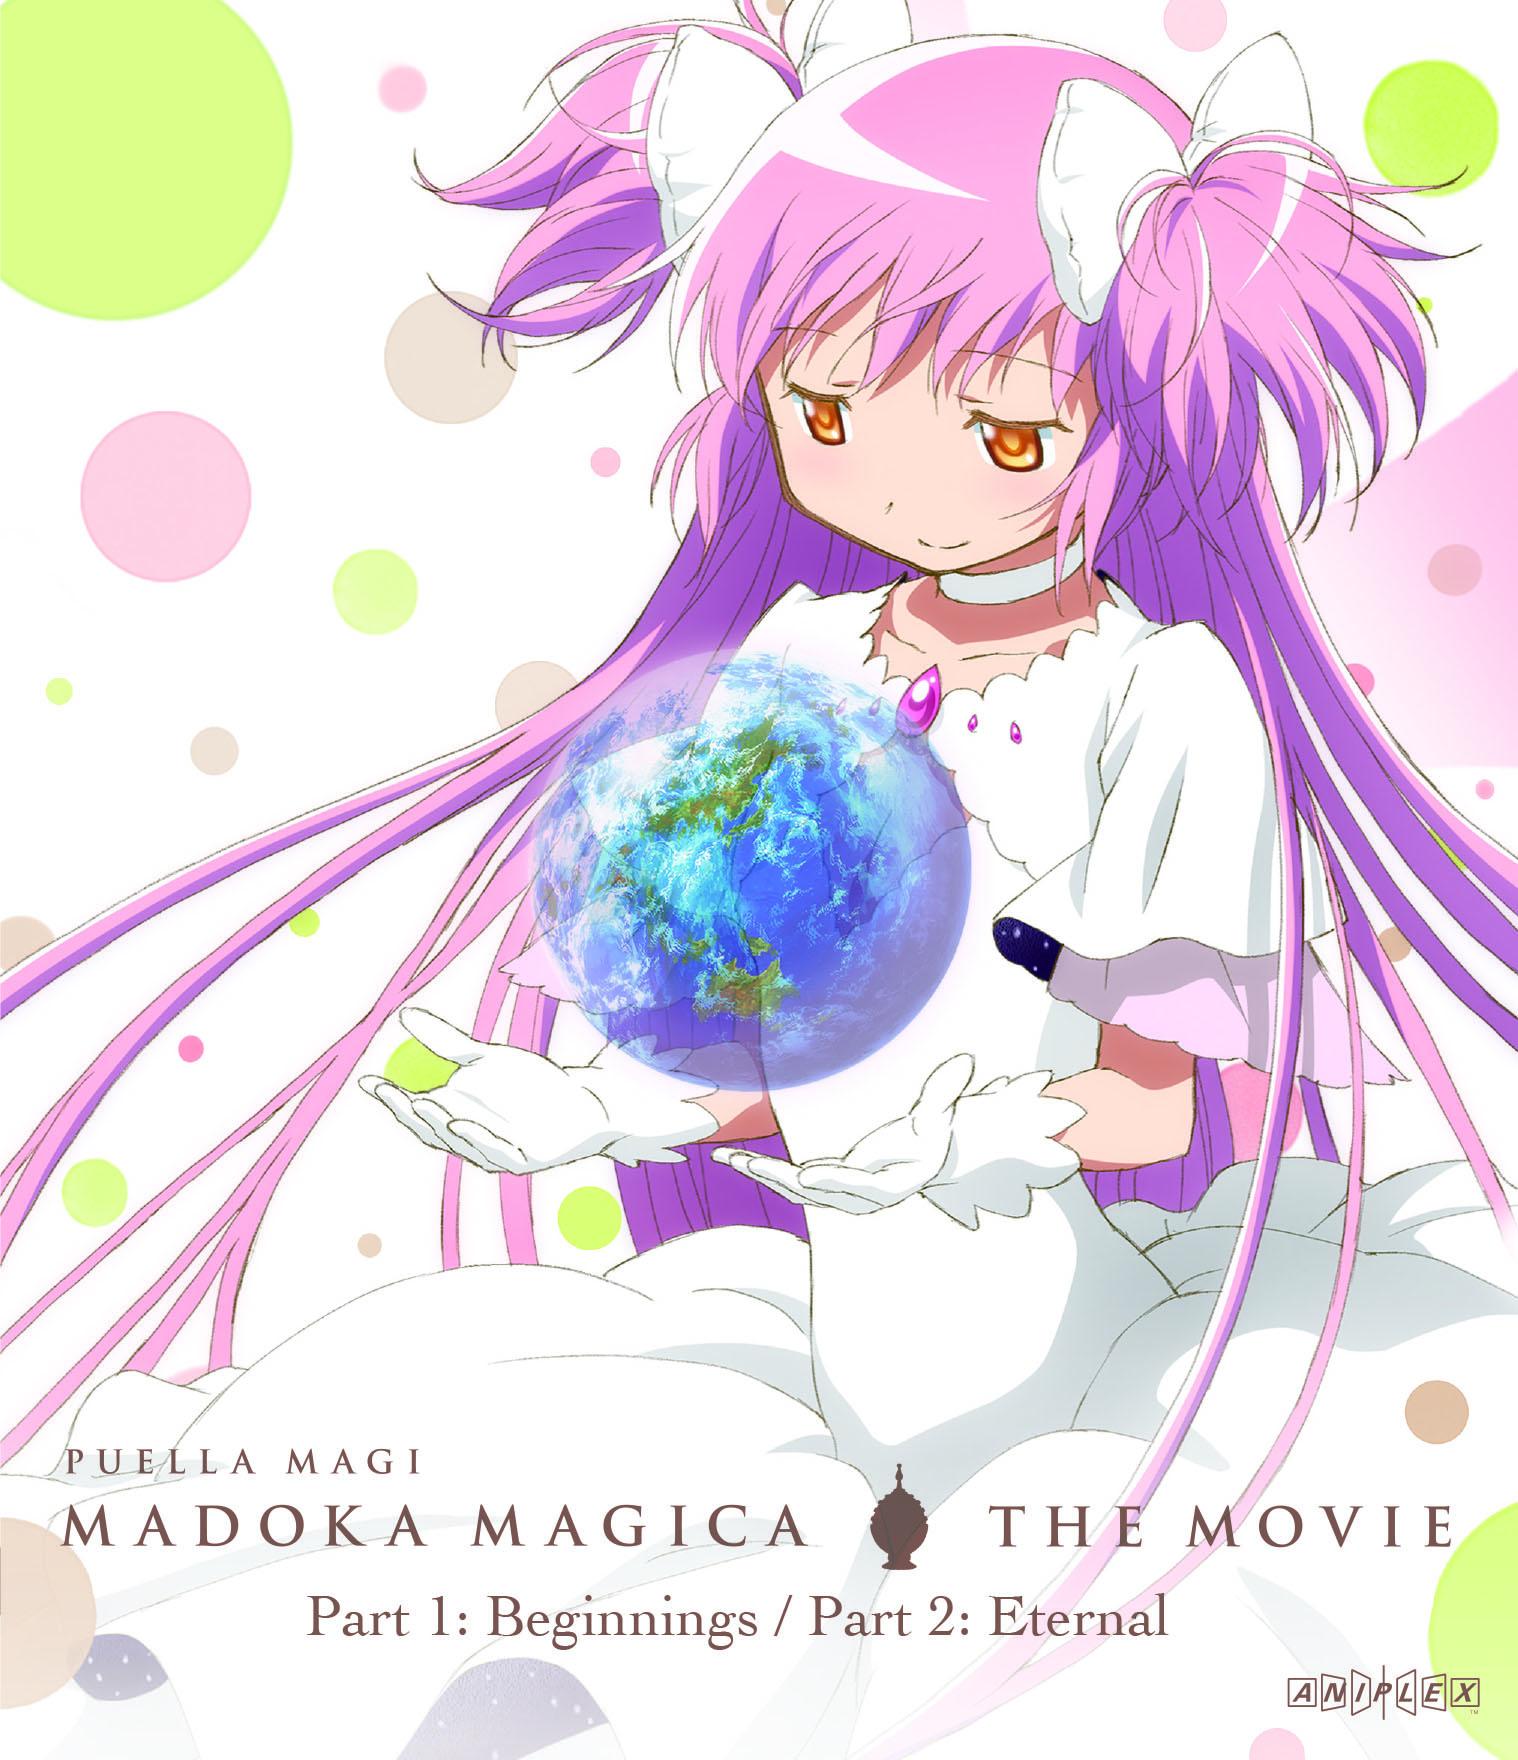 Puella Magi Madoka Magica the Movie Part 1 and 2 Standard Edition Blu-ray